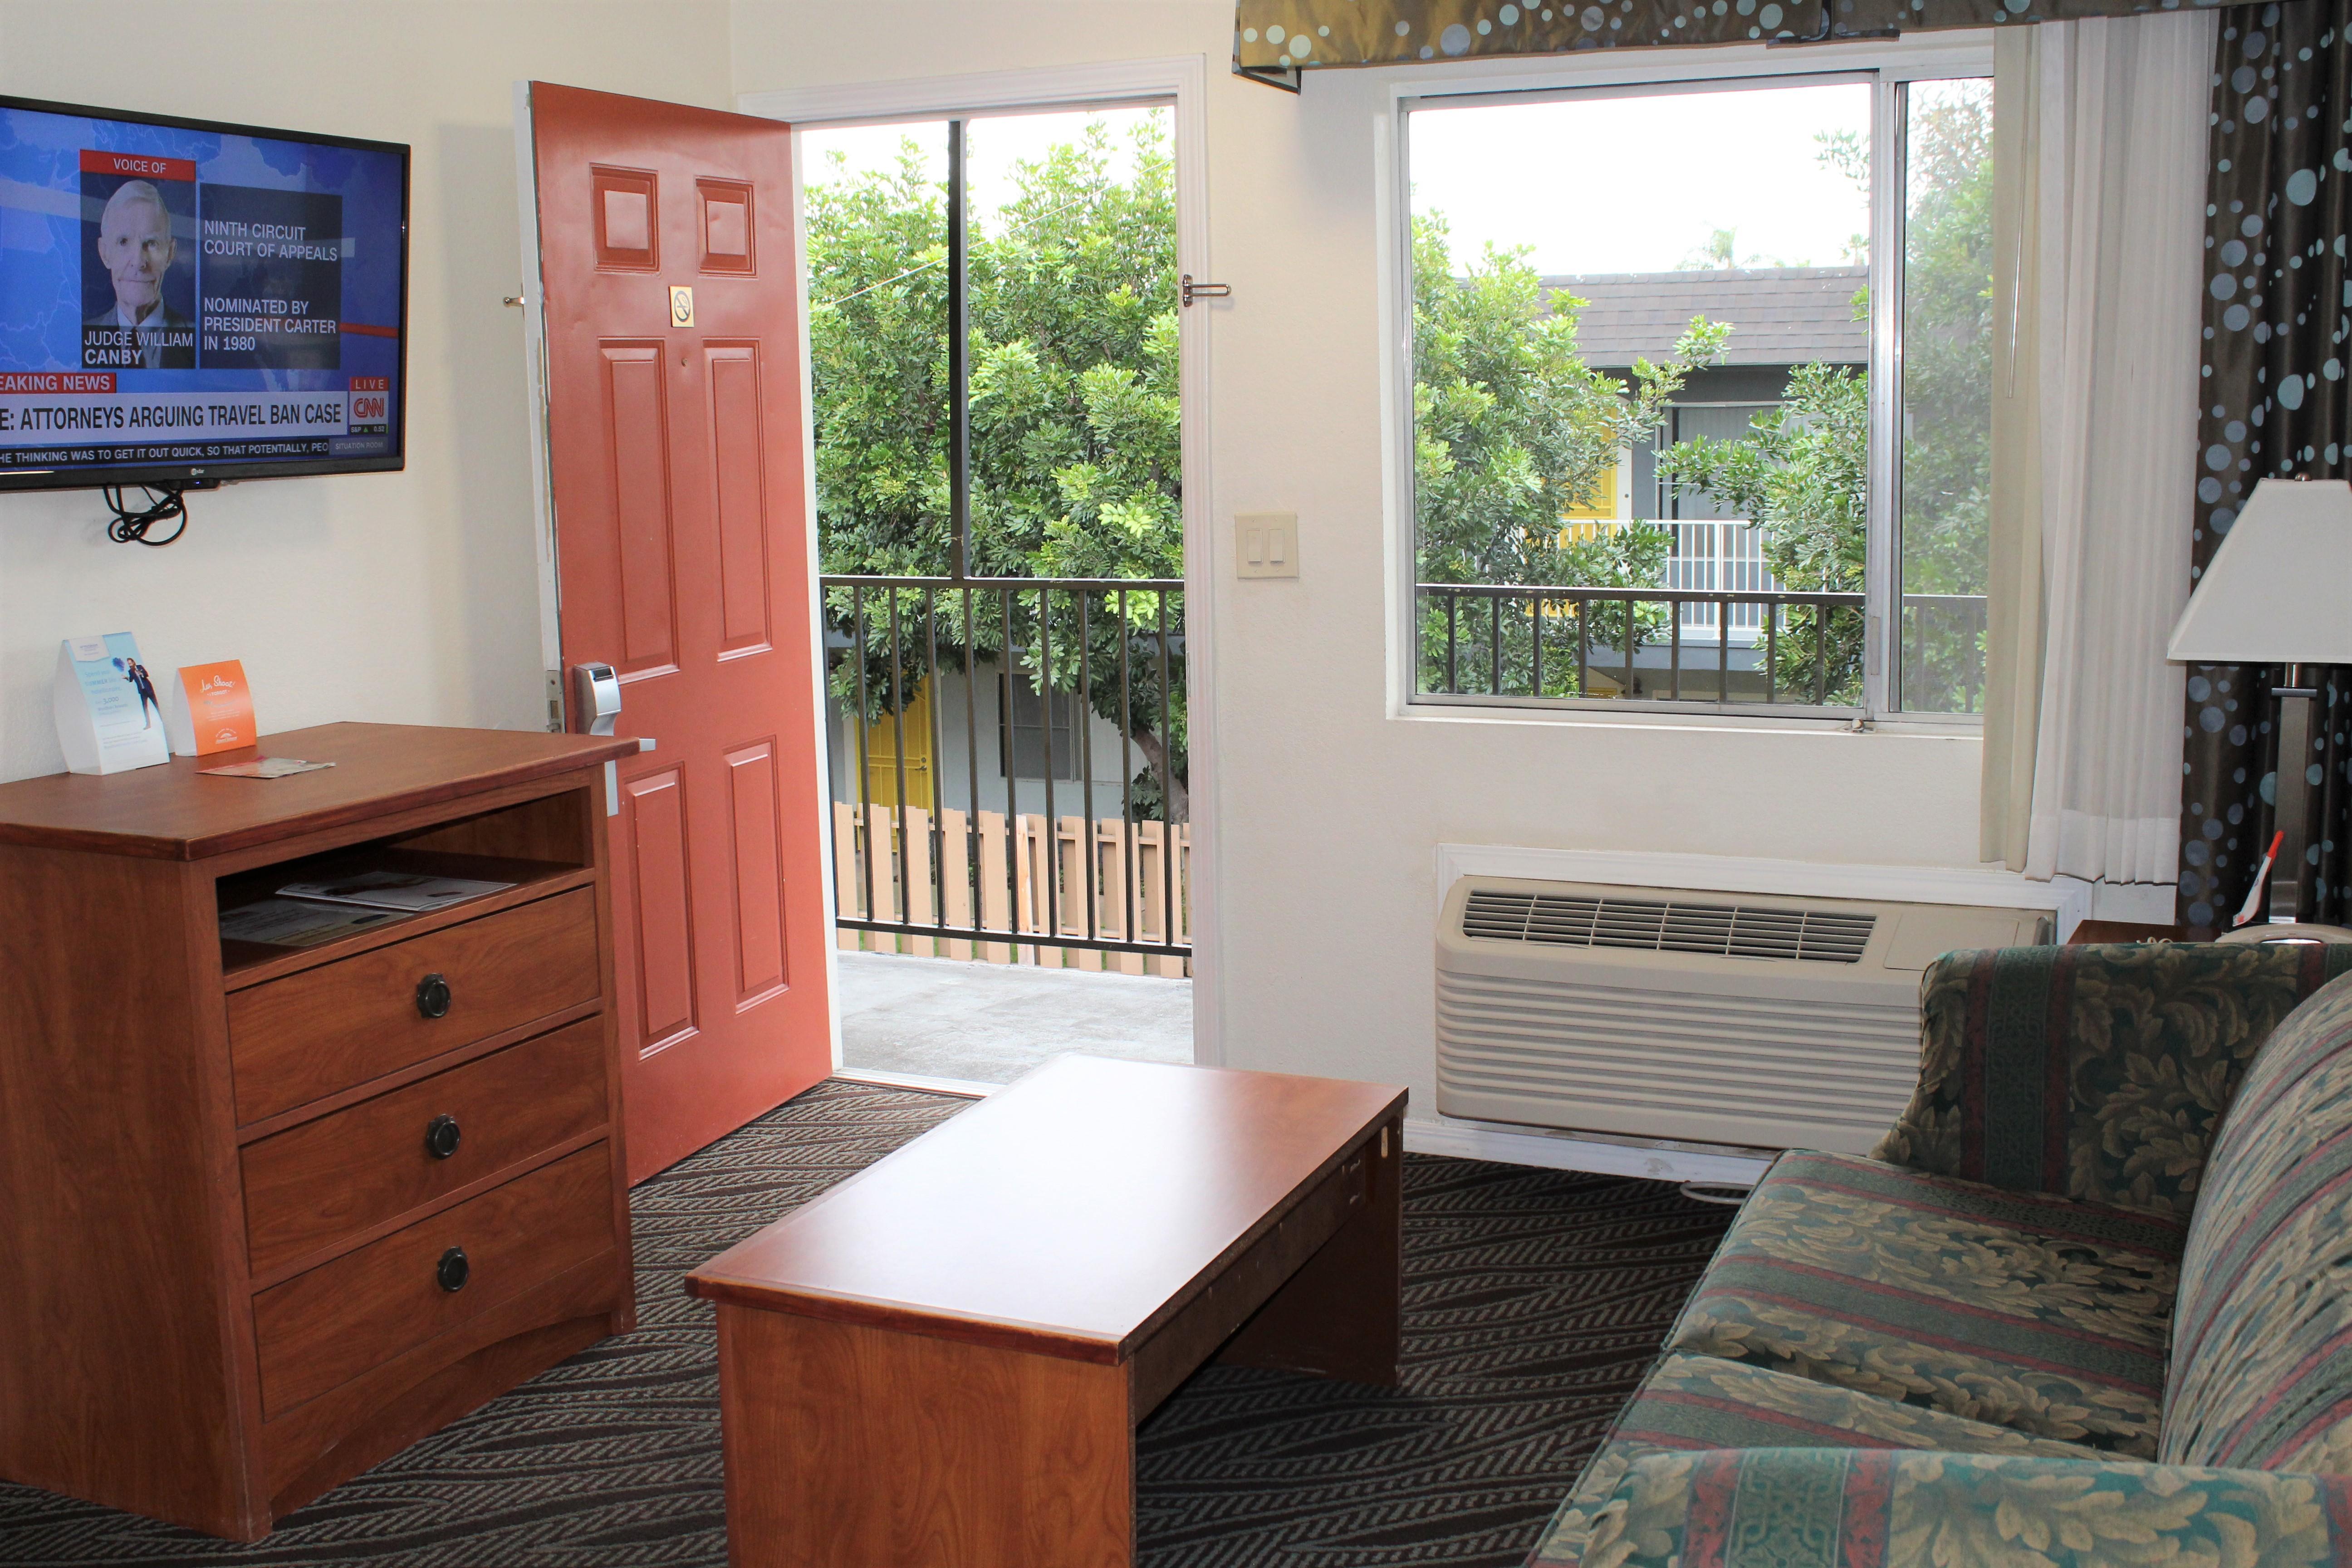 Howard Johnson by Wyndham Chula Vista San Diego Suite Hotel image 3